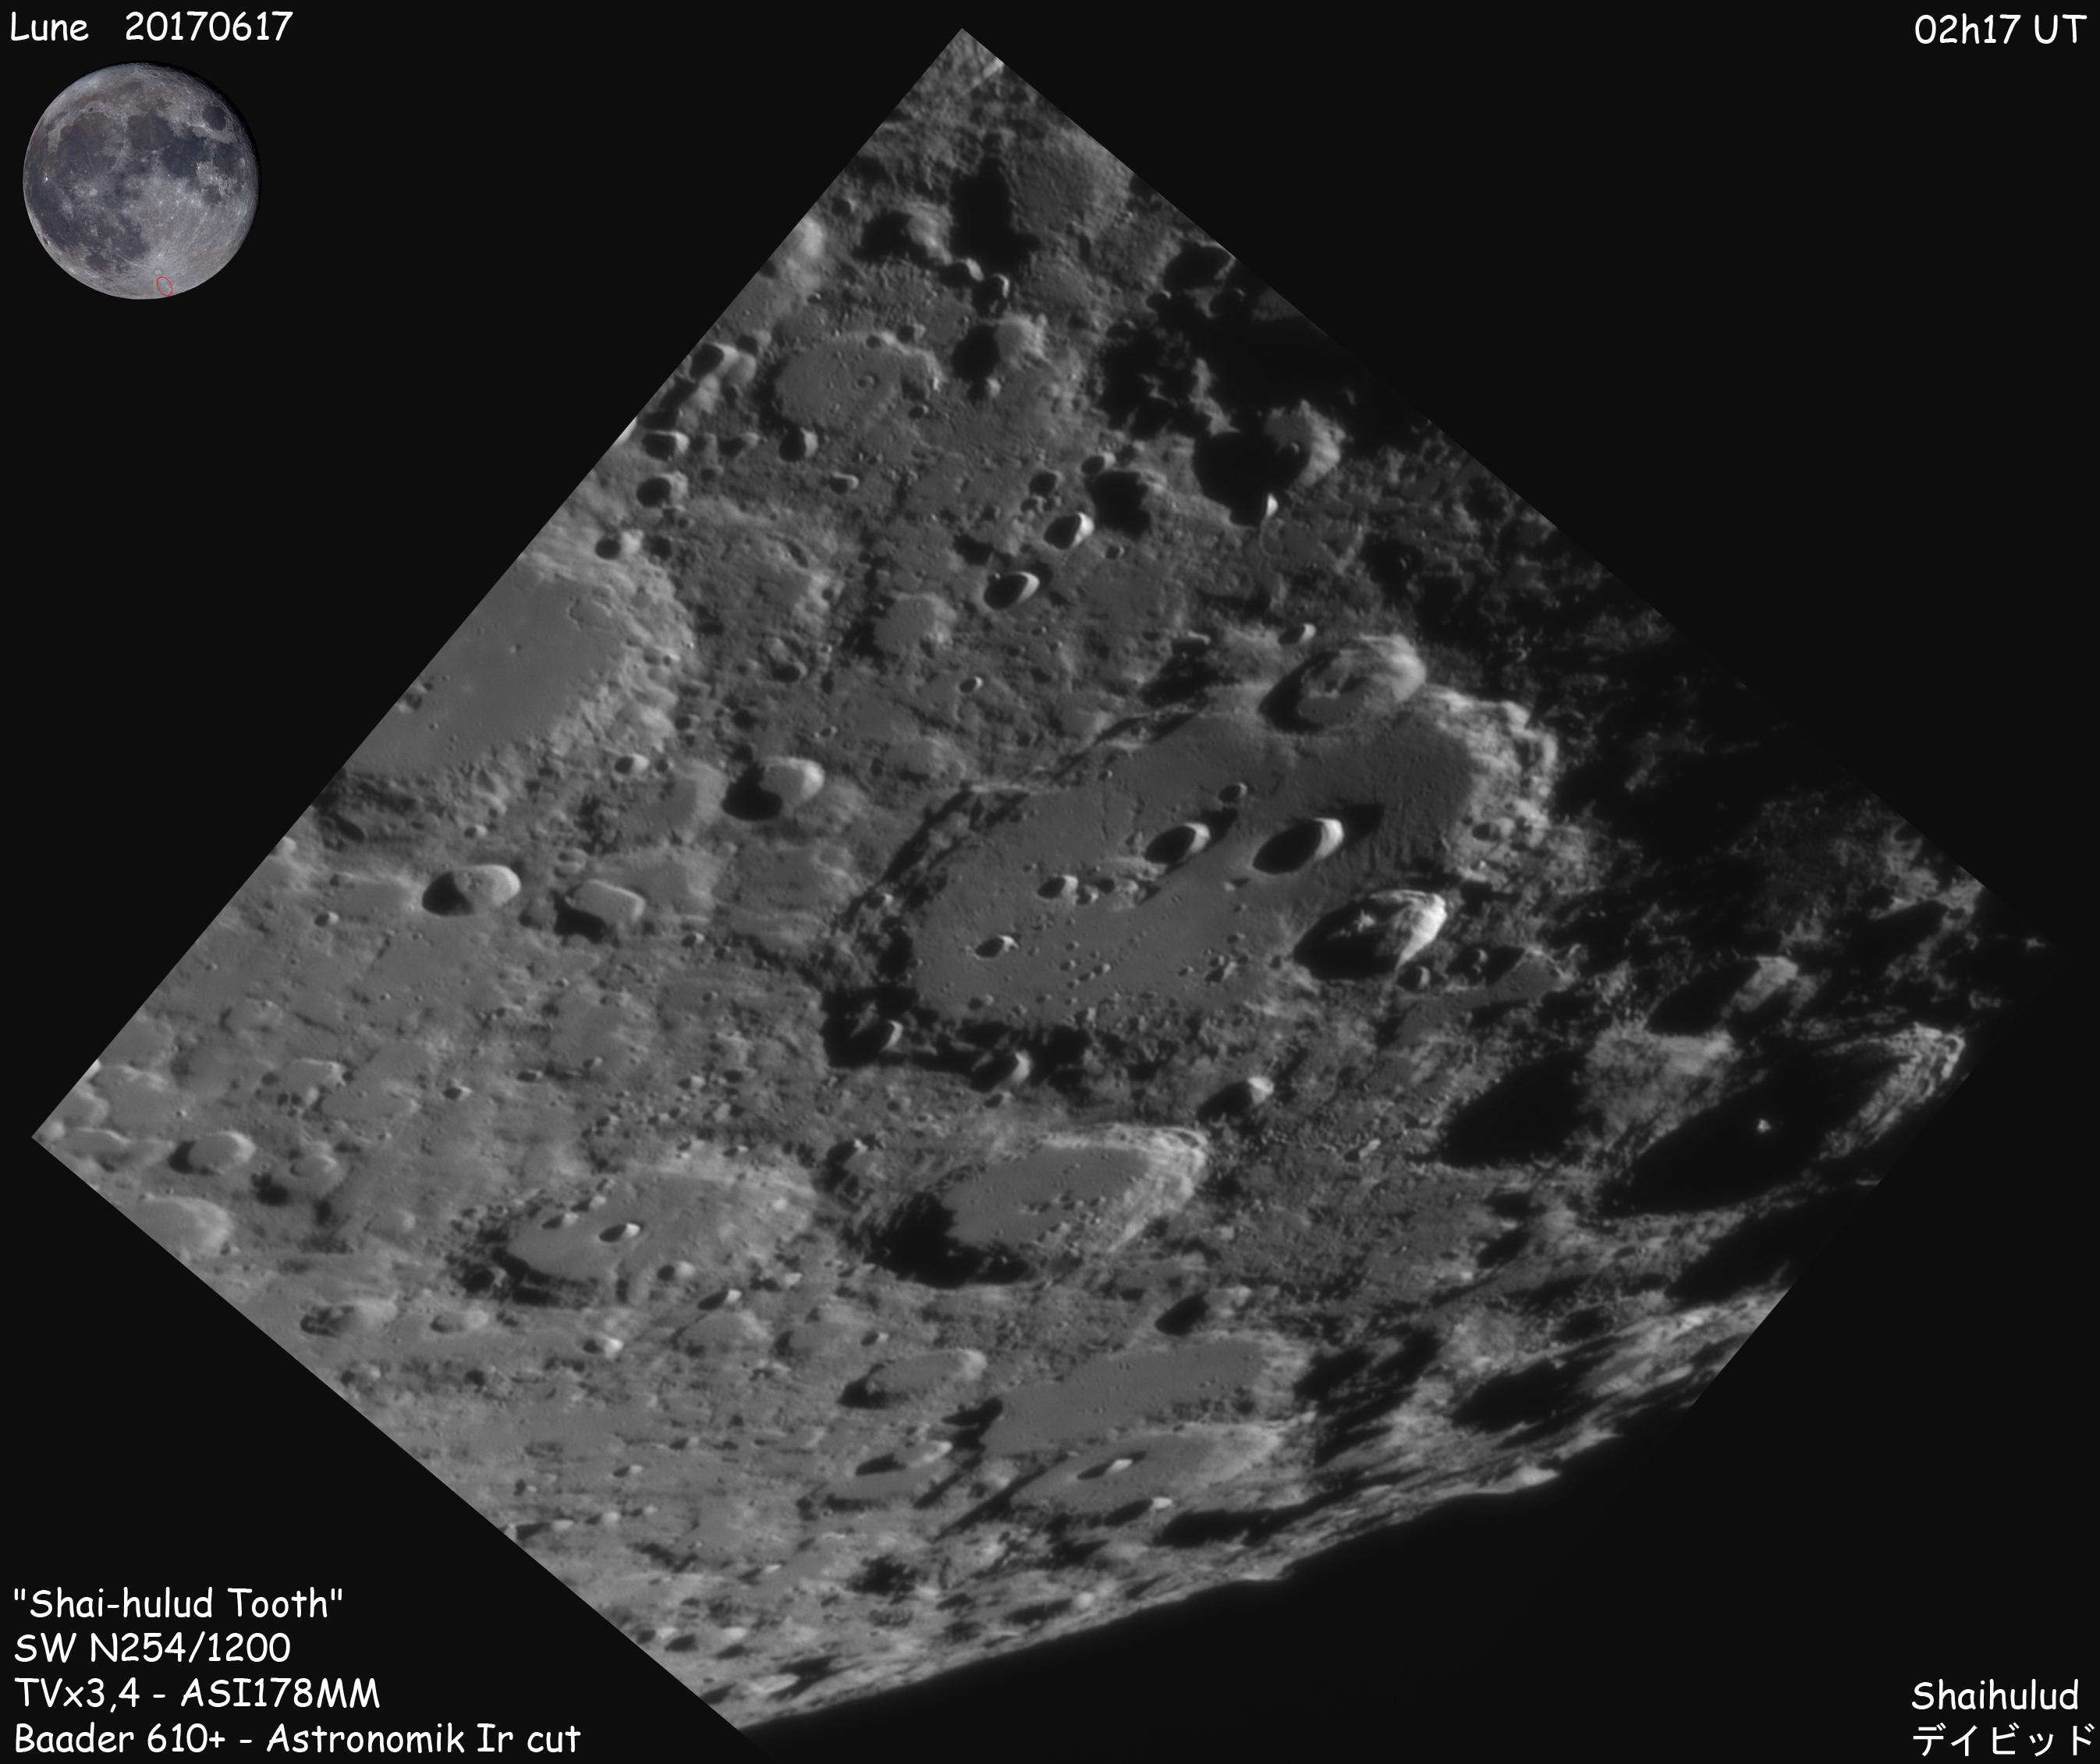 Lune 20170616